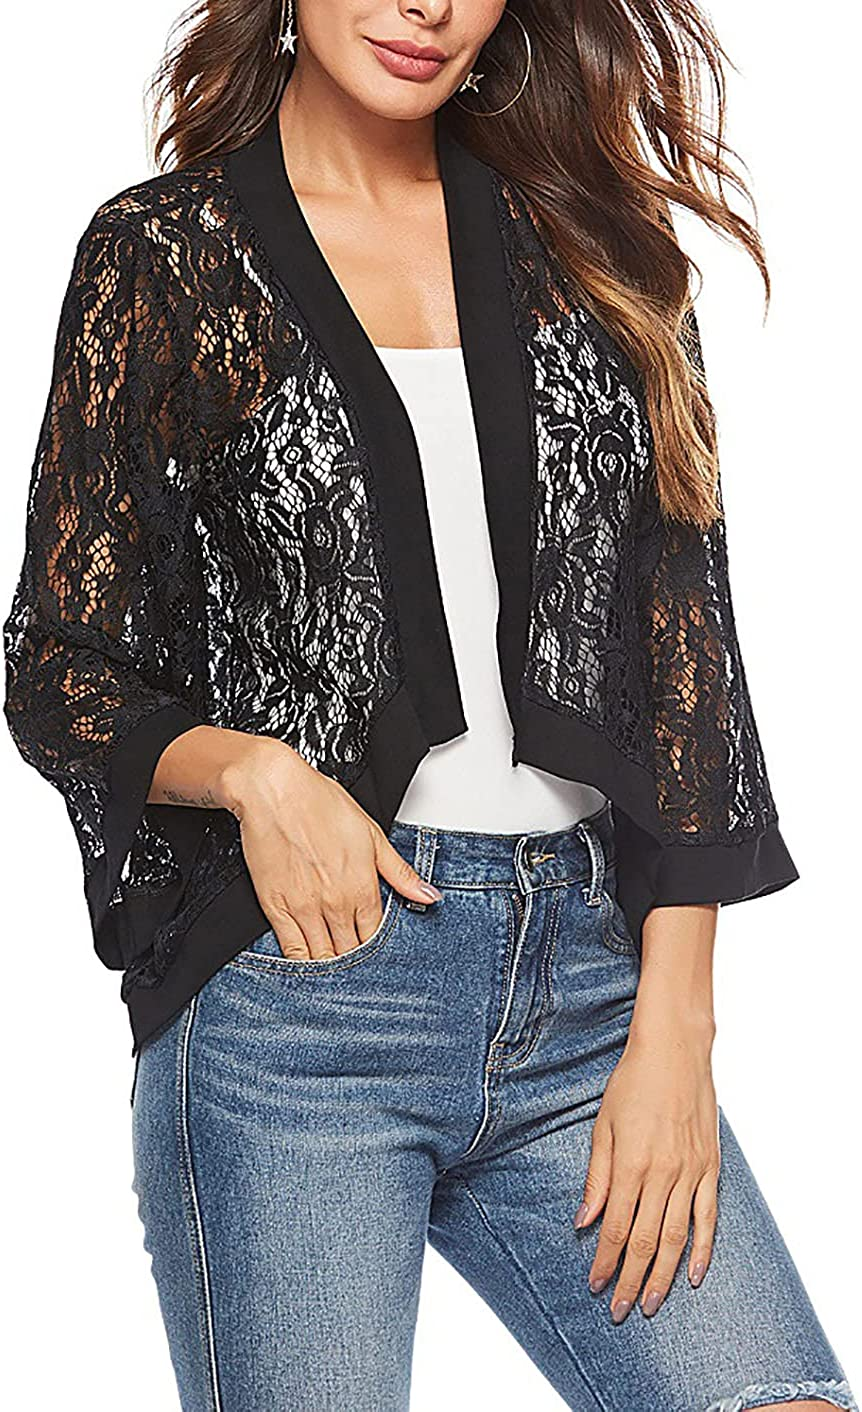 CORIRESHA Womens Shrug Sweater Open Front 3/4 Sleeve Floral Lace Bolero Cardigan